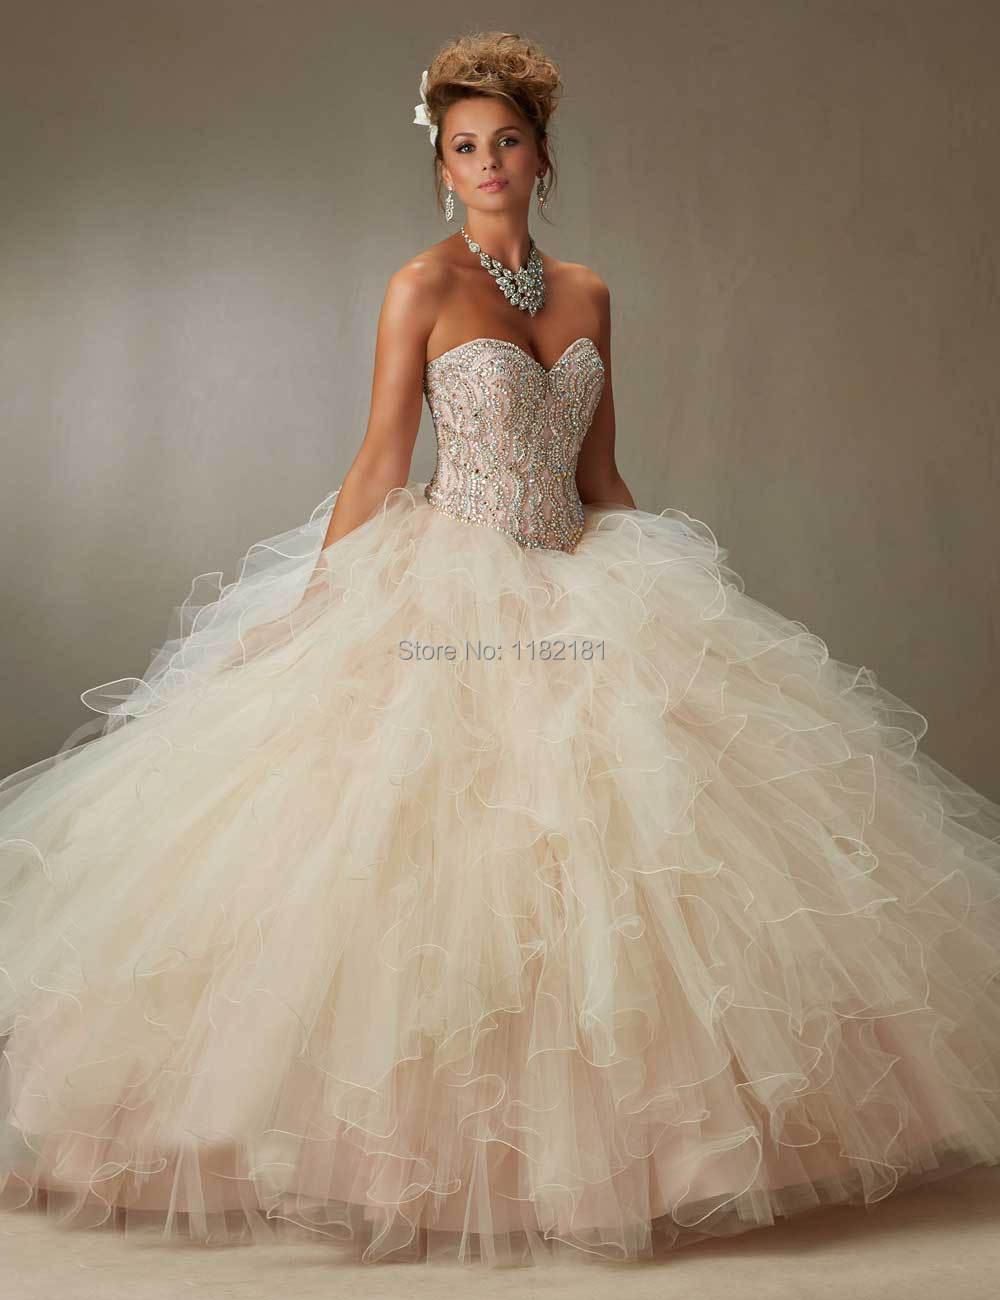 Coral Light Blue Ball Gown Quinceanera Dress Beaded Organza Girls ...